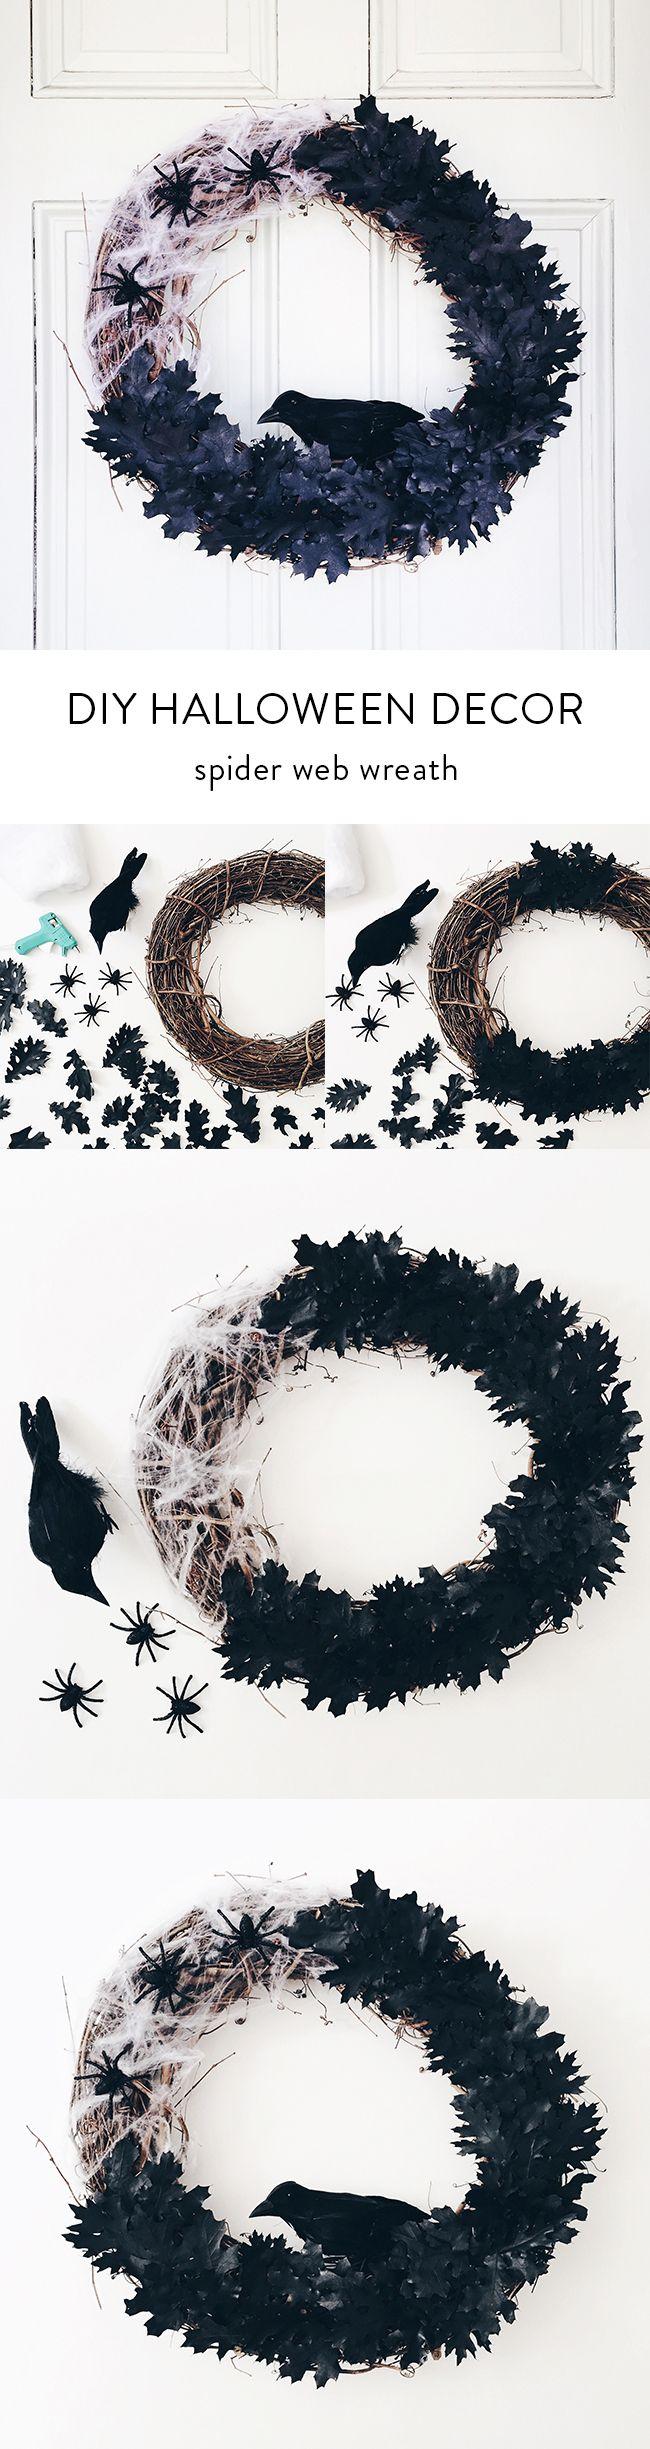 diy halloween decor: spider web wreath